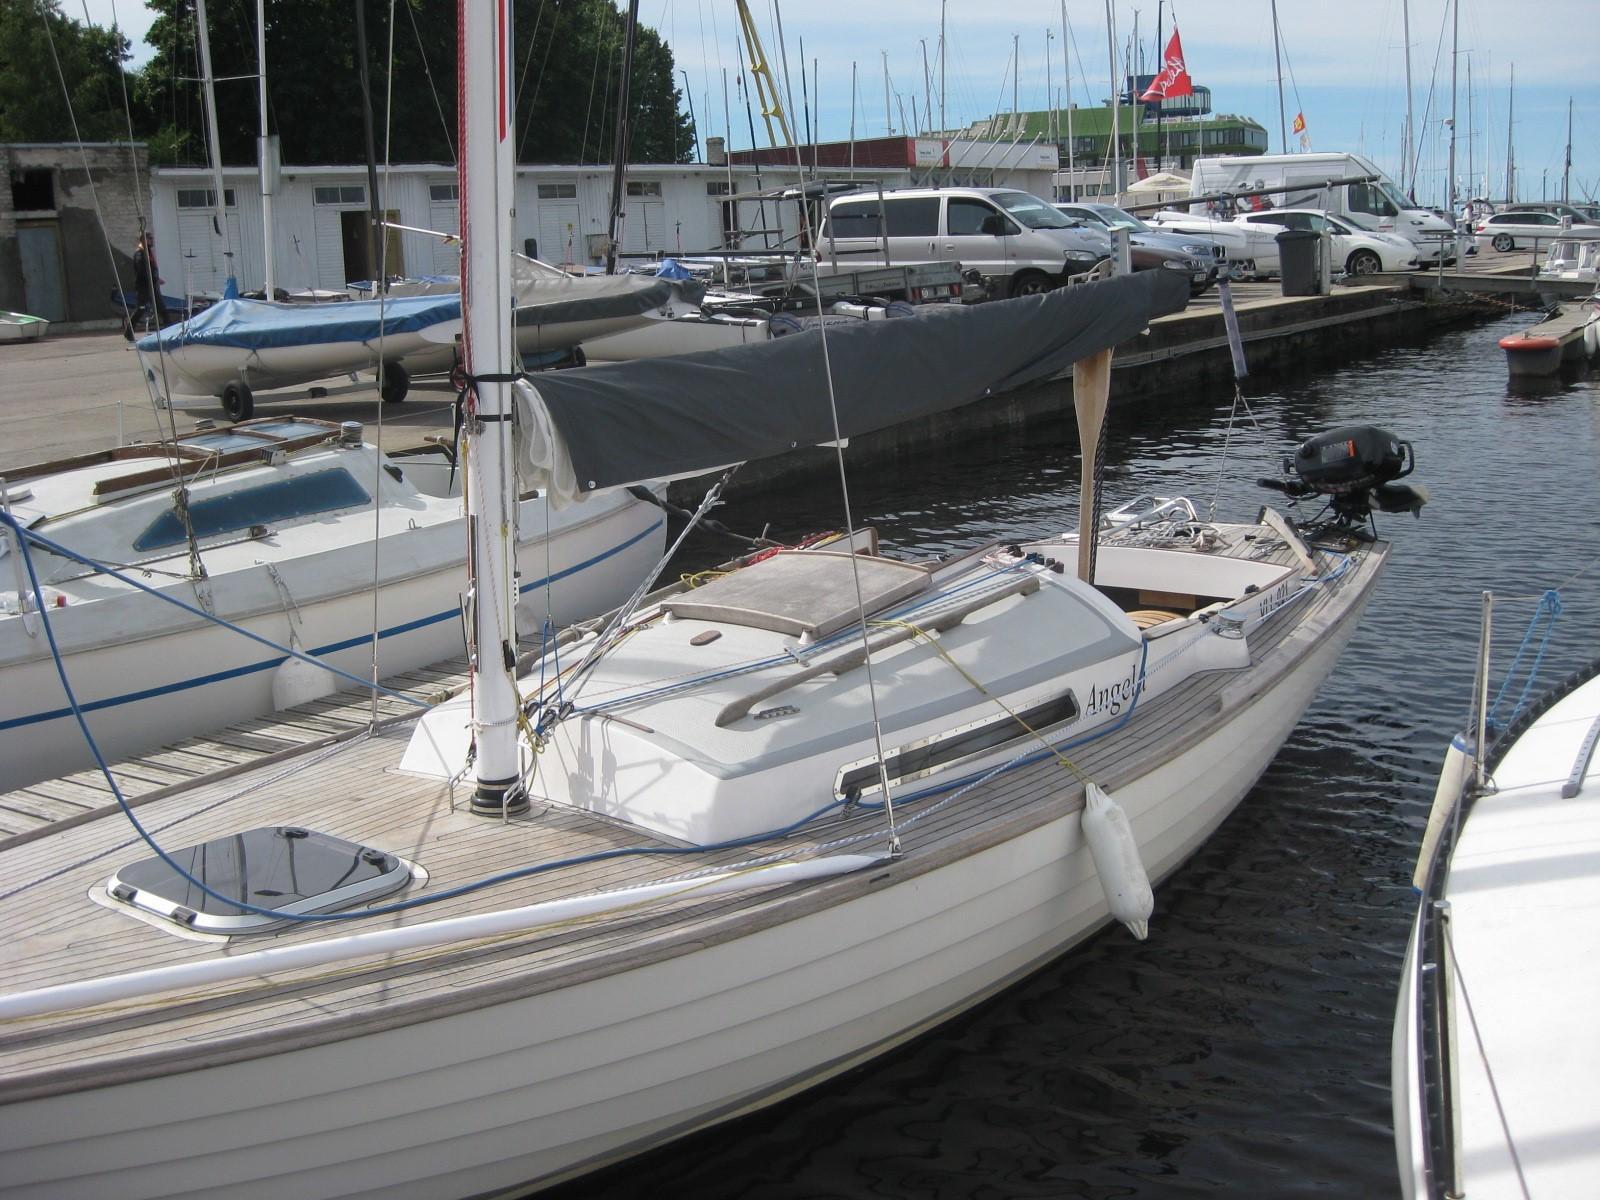 2013 Nordic Folkboat 26 Sail Boat For Sale Www